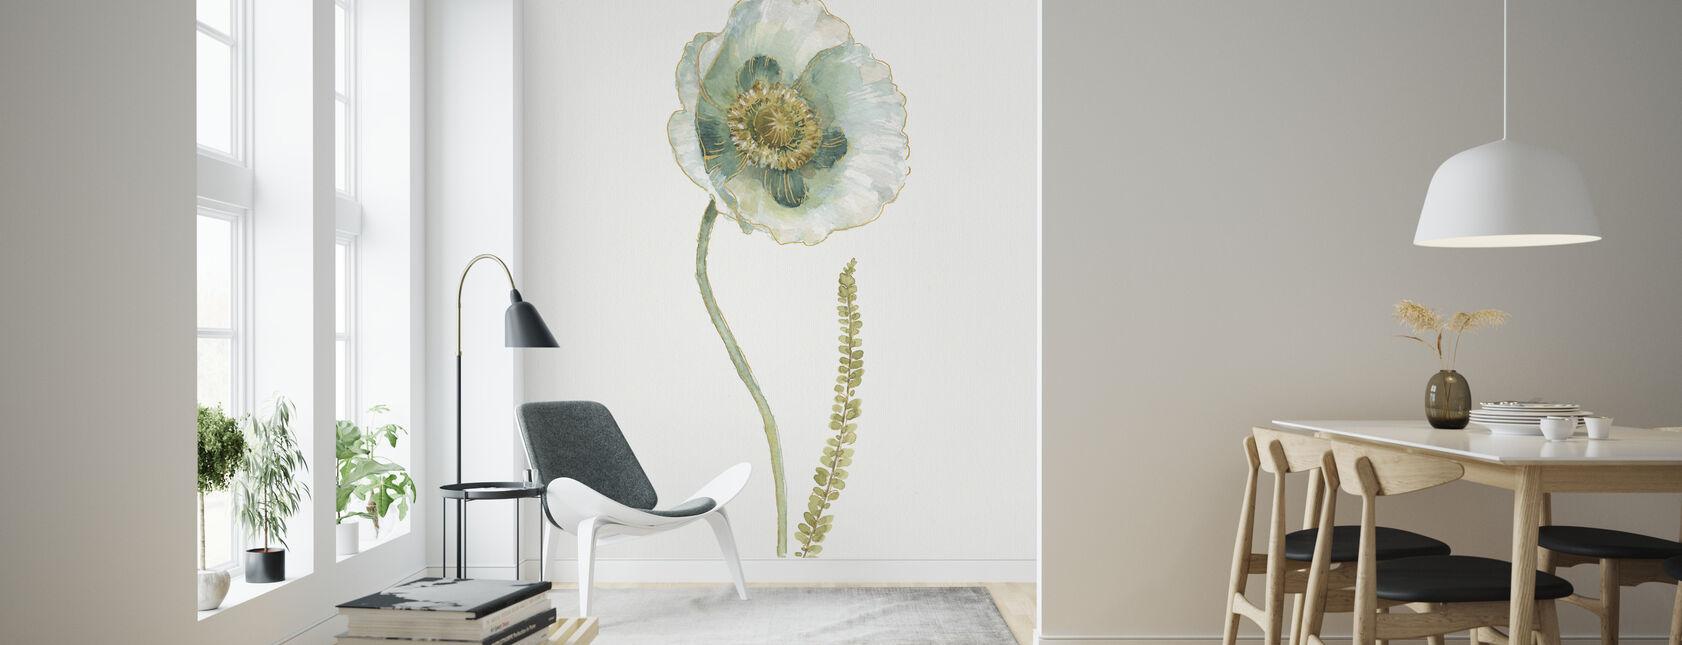 My Greenhouse Single Poppy I - Wallpaper - Living Room